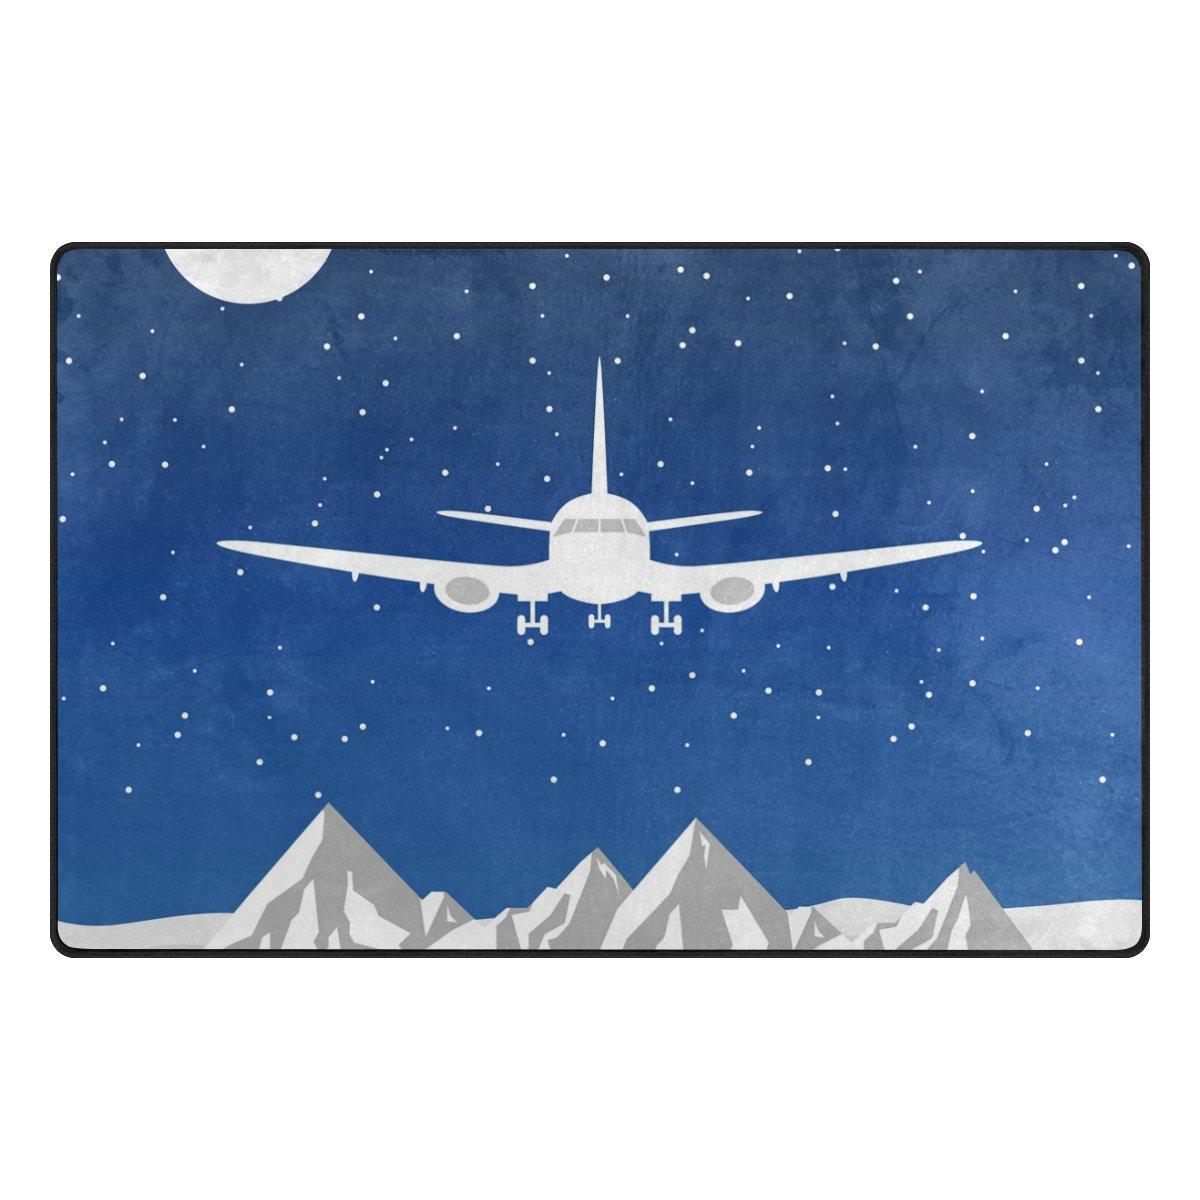 Benni giry Rango de avión Alfombra antideslizante Diario de DF920felpudos para salón dormitorio 78,7x 50,8cm, poliéster, multicolor, 31 x 20 inch